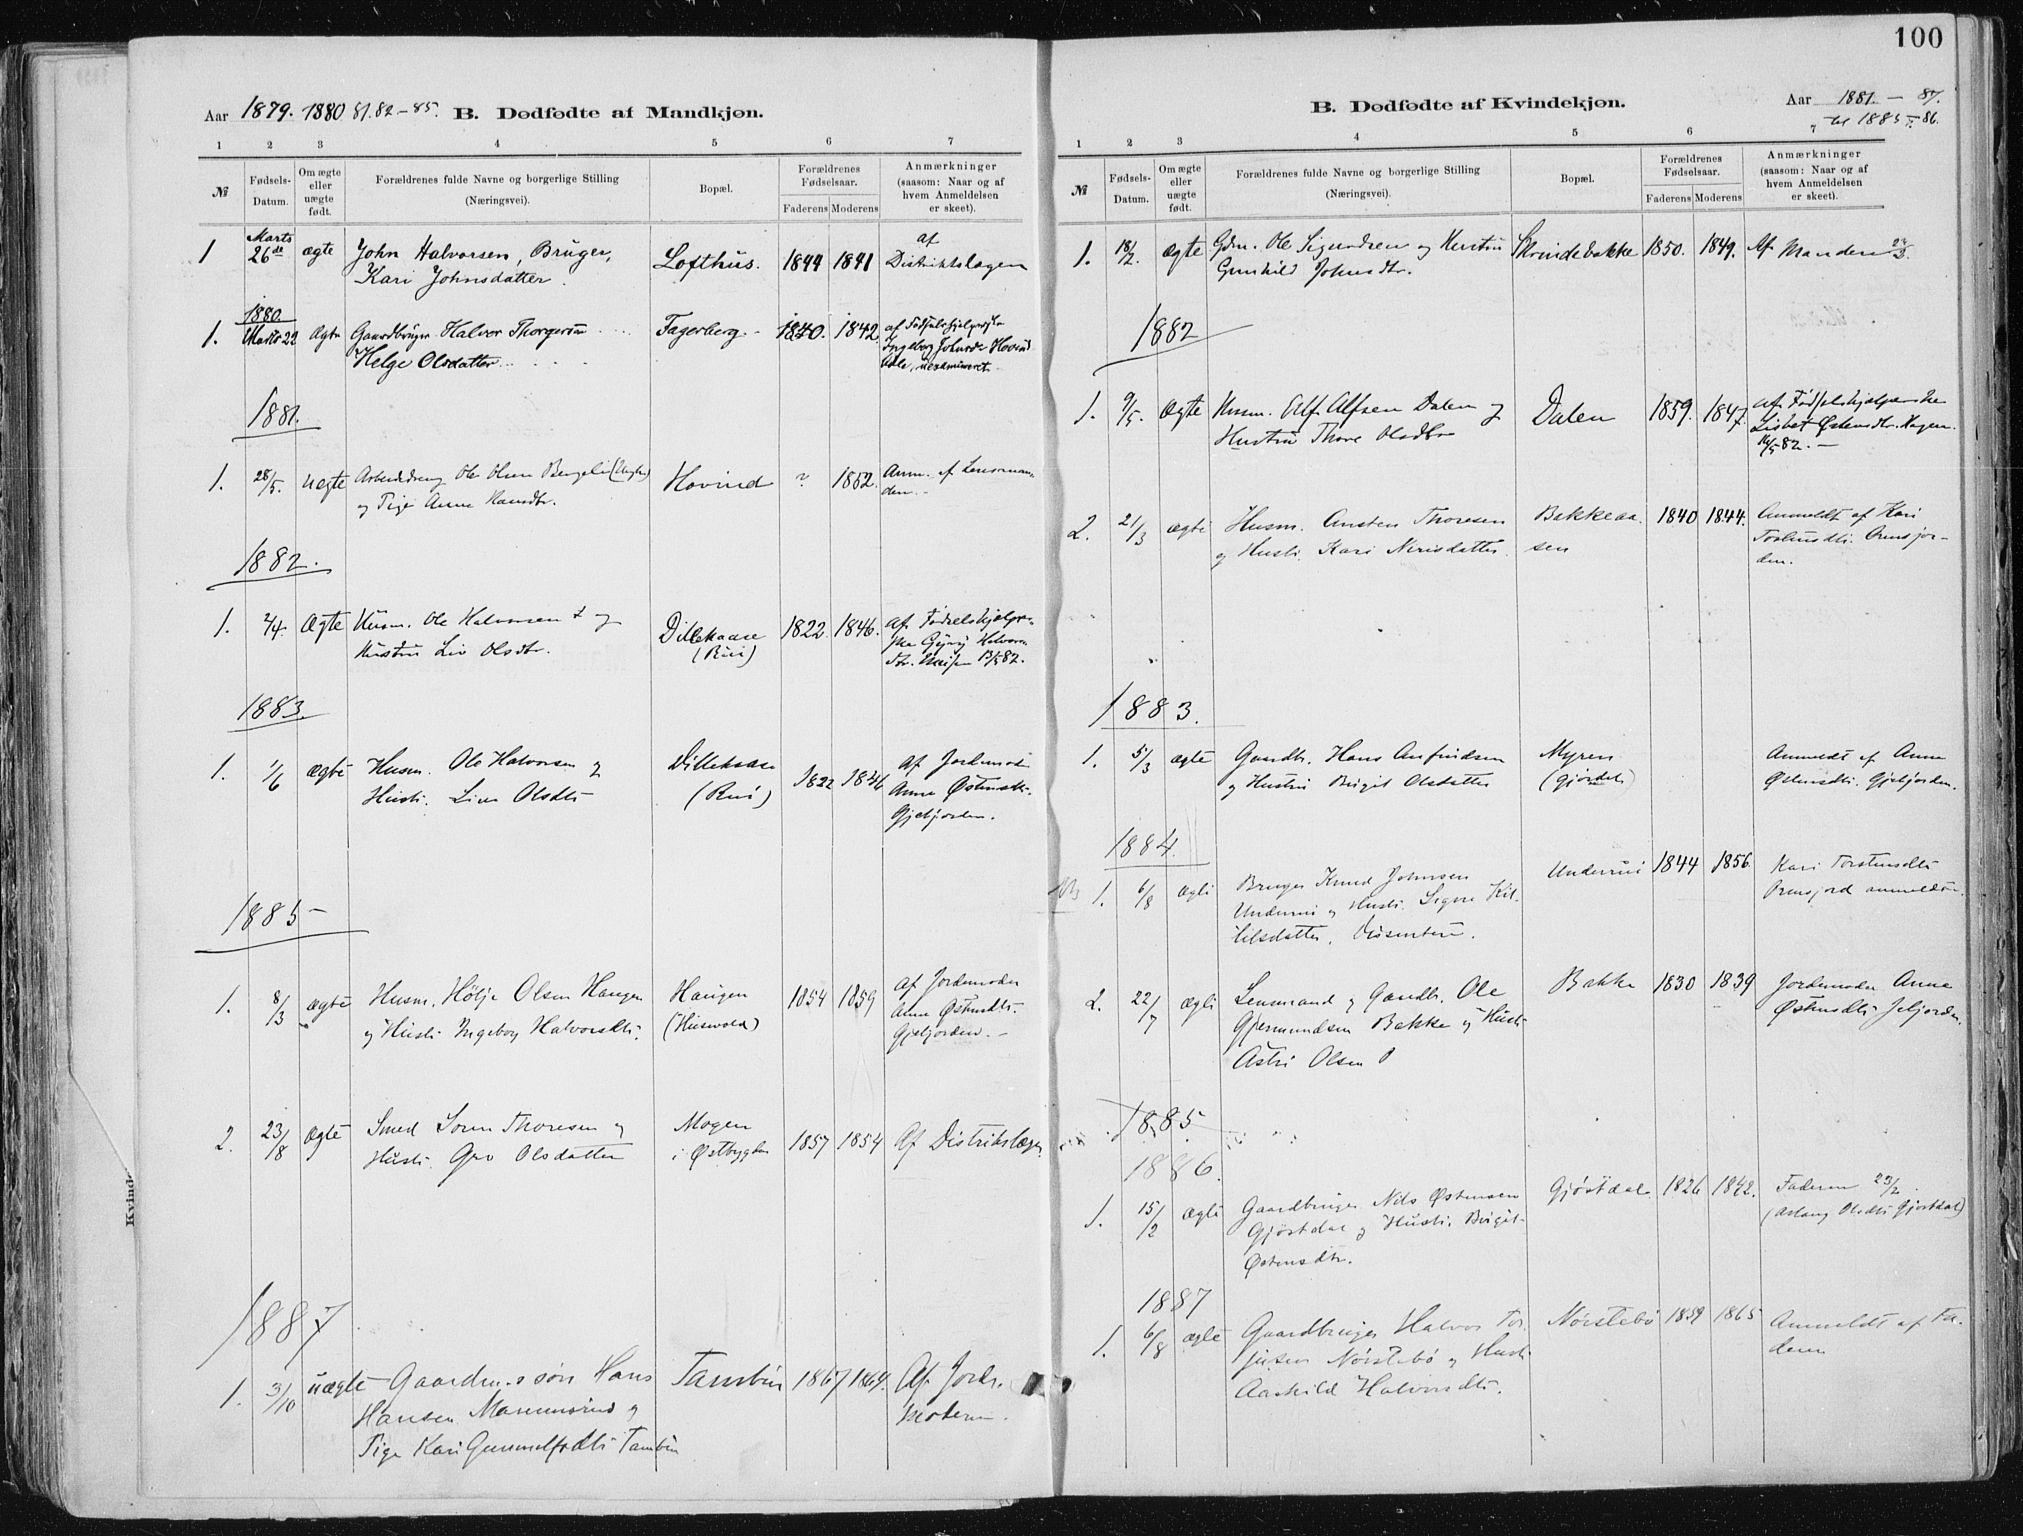 SAKO, Tinn kirkebøker, F/Fa/L0007: Ministerialbok nr. I 7, 1878-1922, s. 100